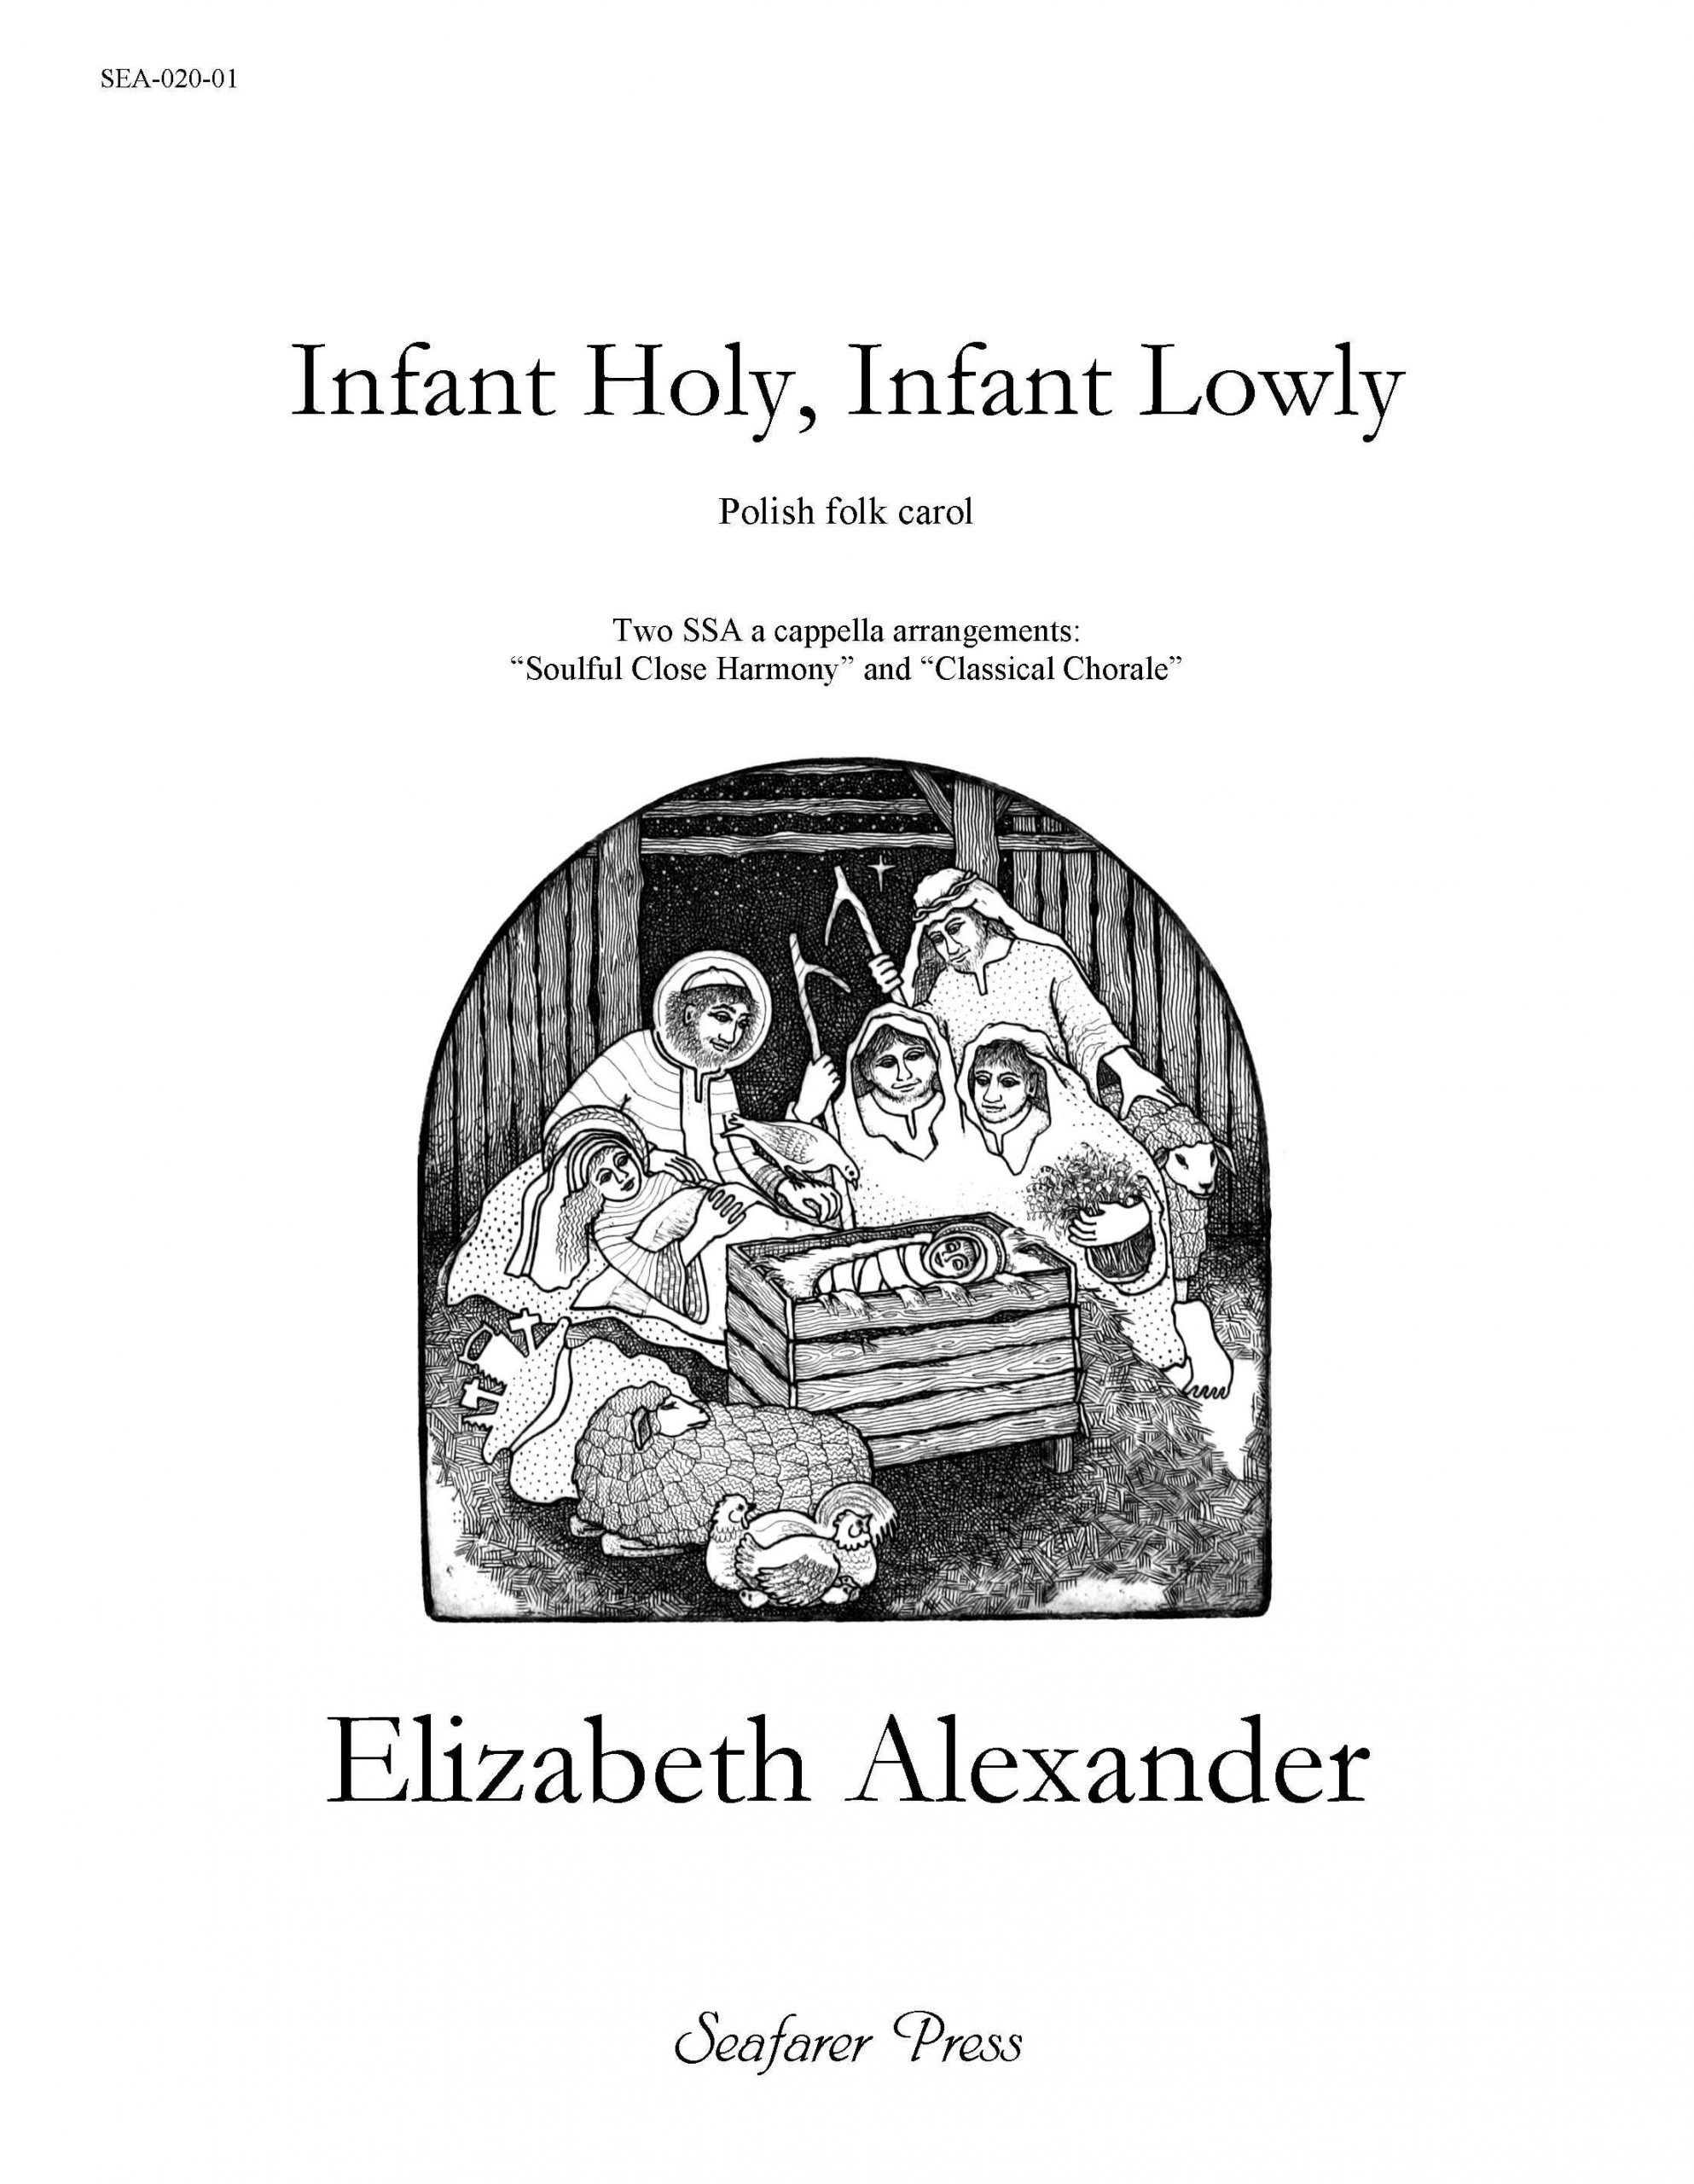 SEA-020-01 - Infant Holy, Infant Lowly